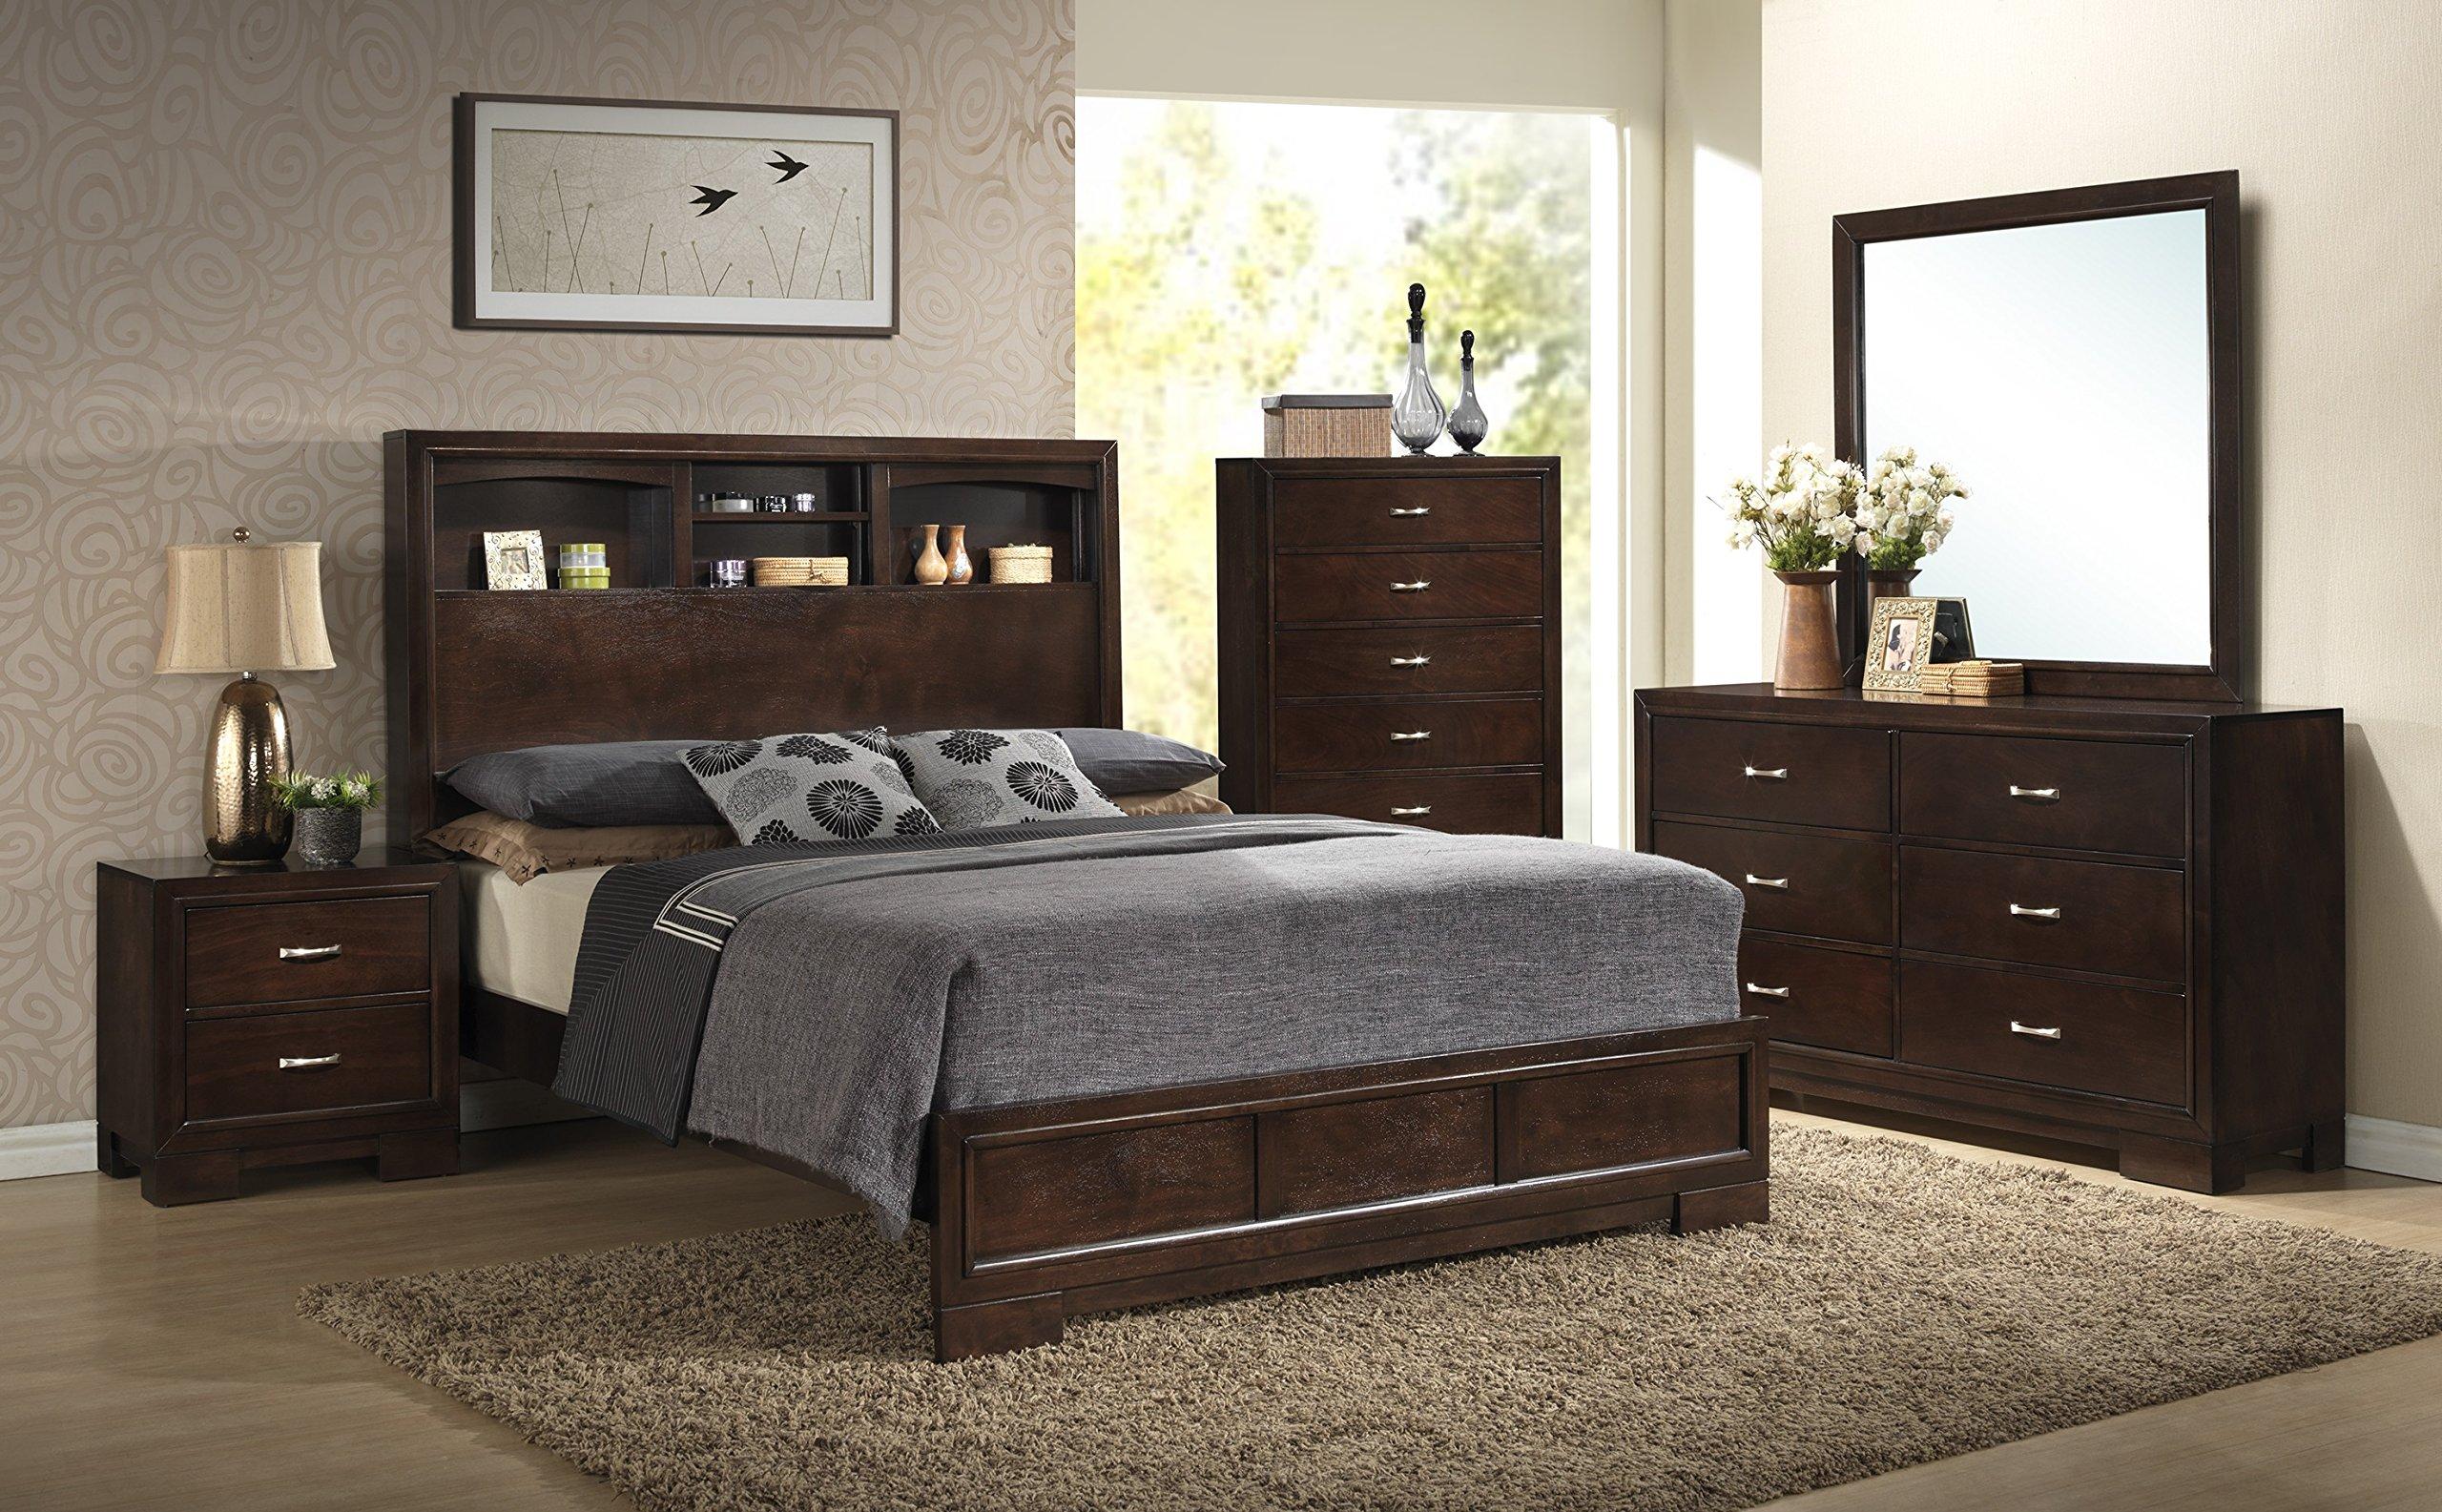 Roundhill Furniture Montana Modern 5-Piece Wood Bedroom Set with Bed, Dresser, Mirror, Nightstand, Chest, King, Walnut